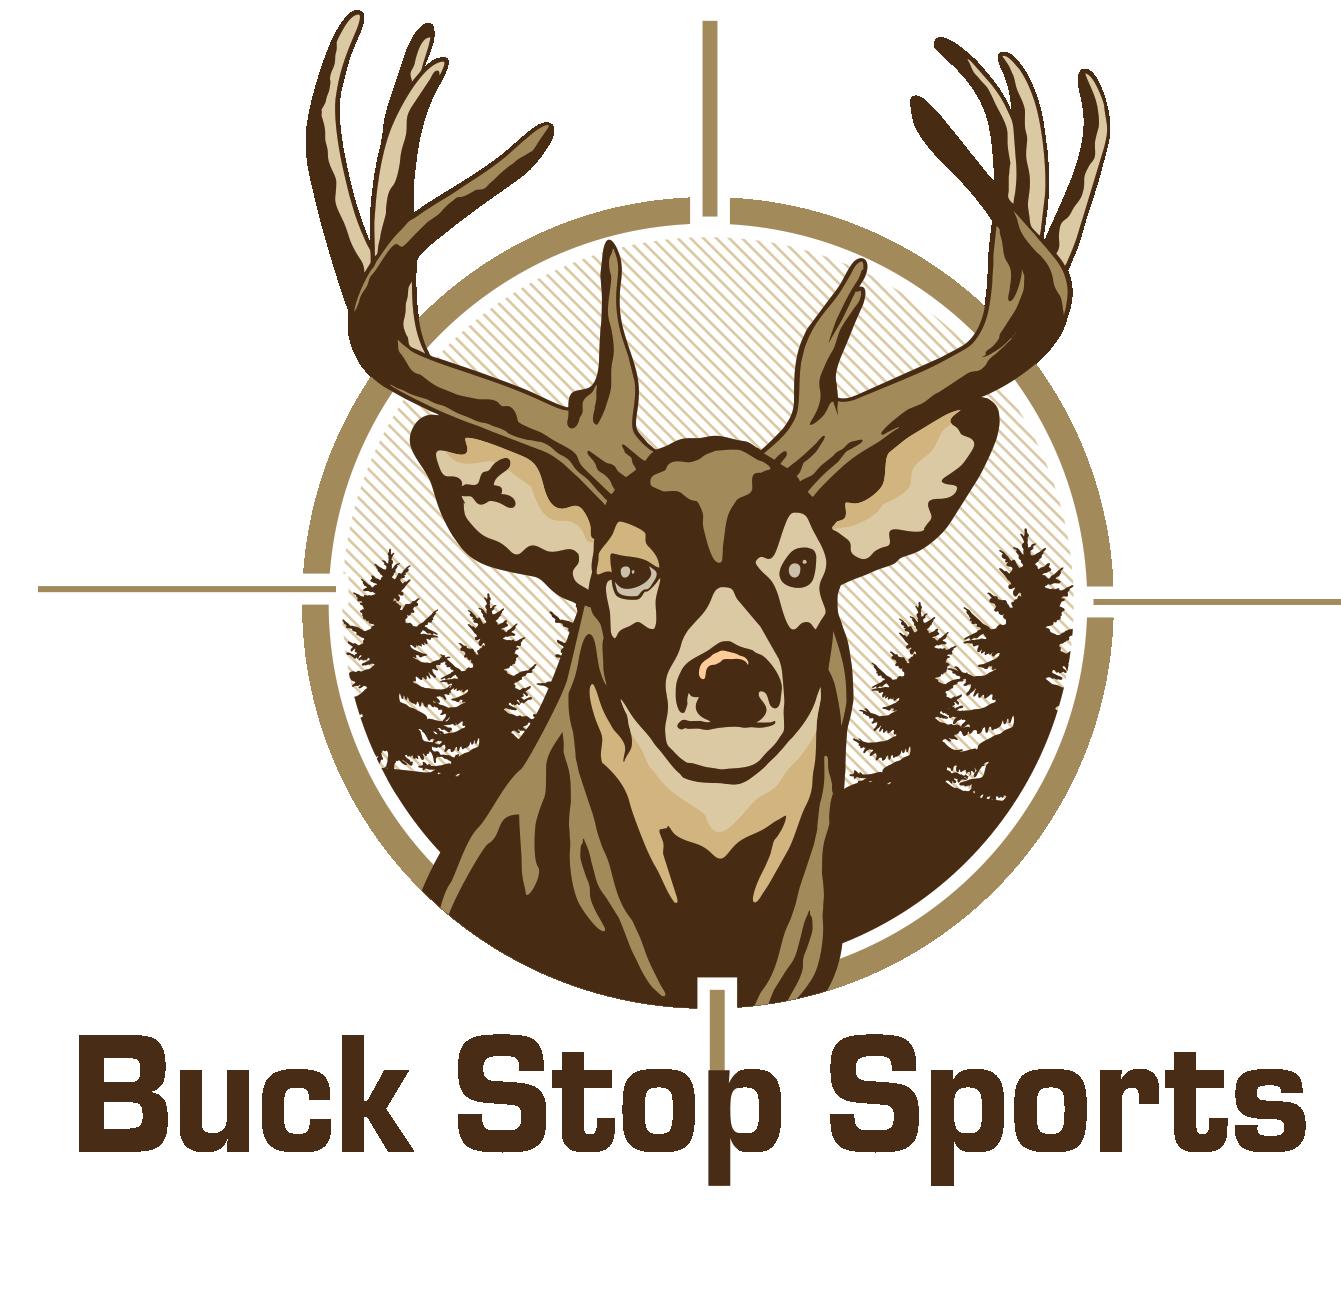 BuckStop Sports